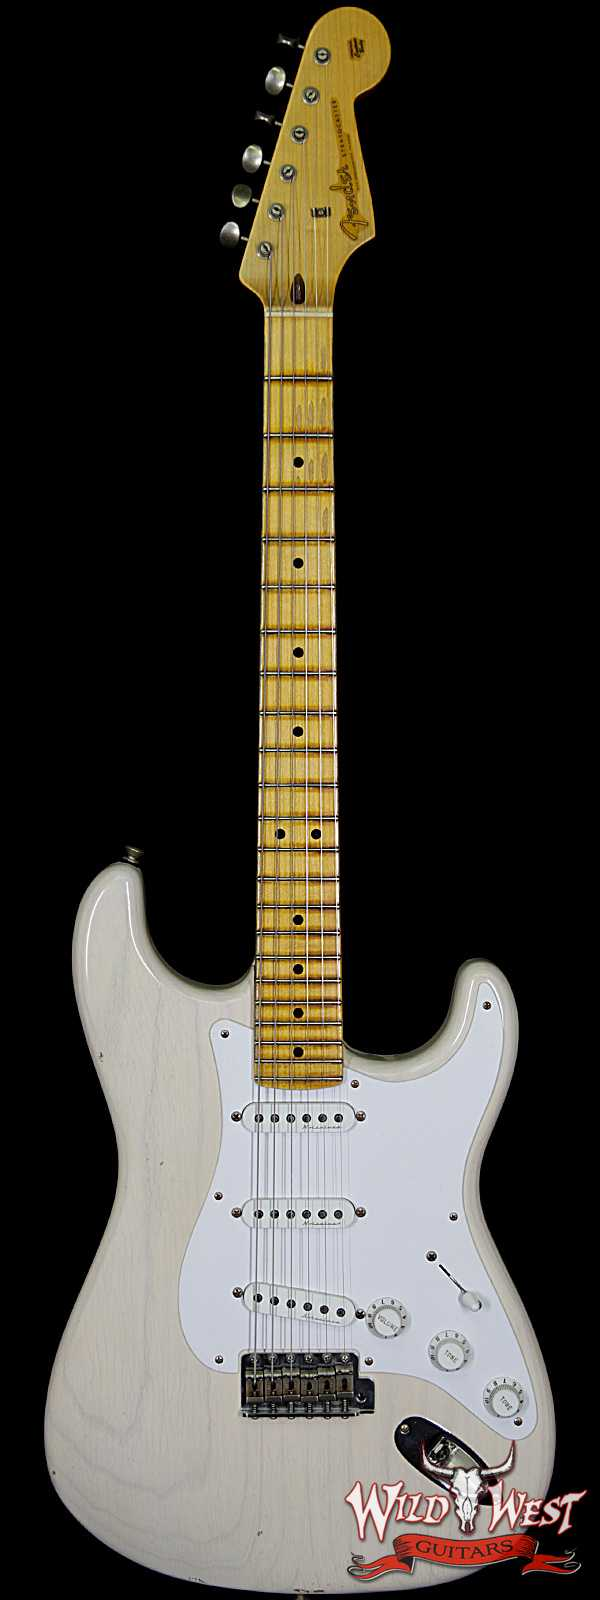 Fender Custom Shop Masterbuilt Todd Krause Clapton Stratocaster Journeyman Relic Aged White Blonde